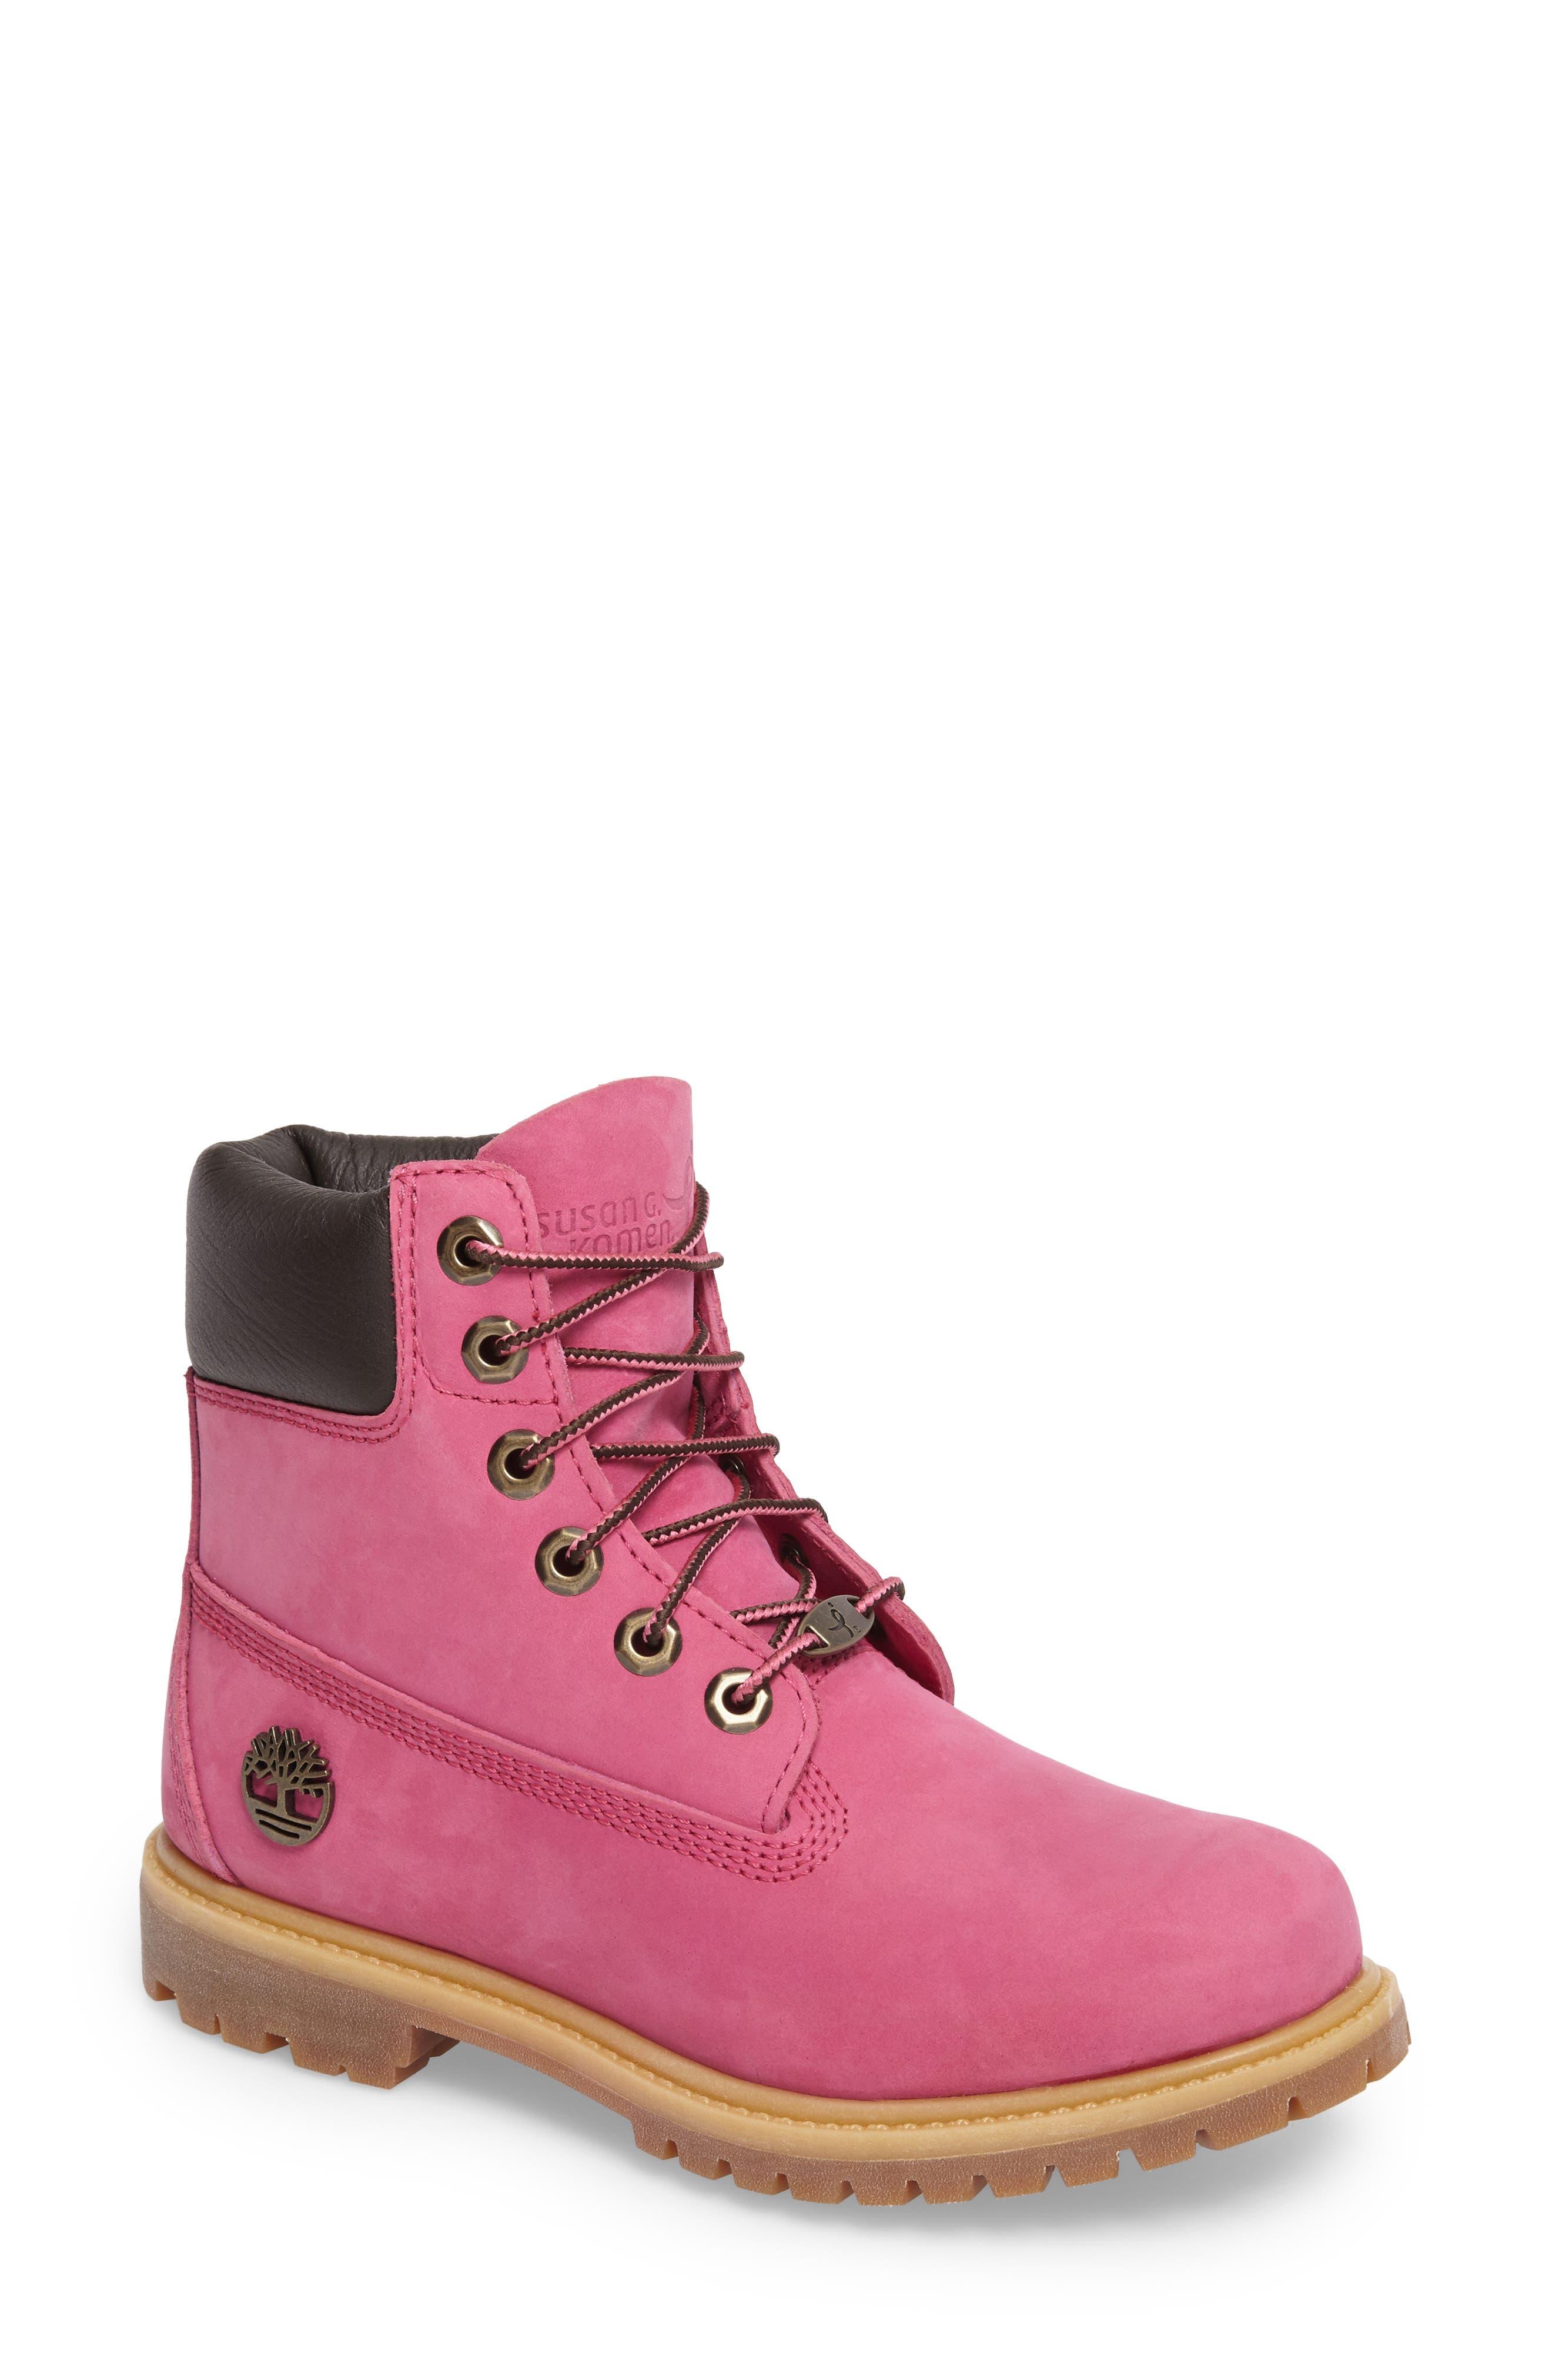 x Susan G. Komen 6-Inch Waterproof Insulated Boot,                             Main thumbnail 1, color,                             Bright Pink Nubuck